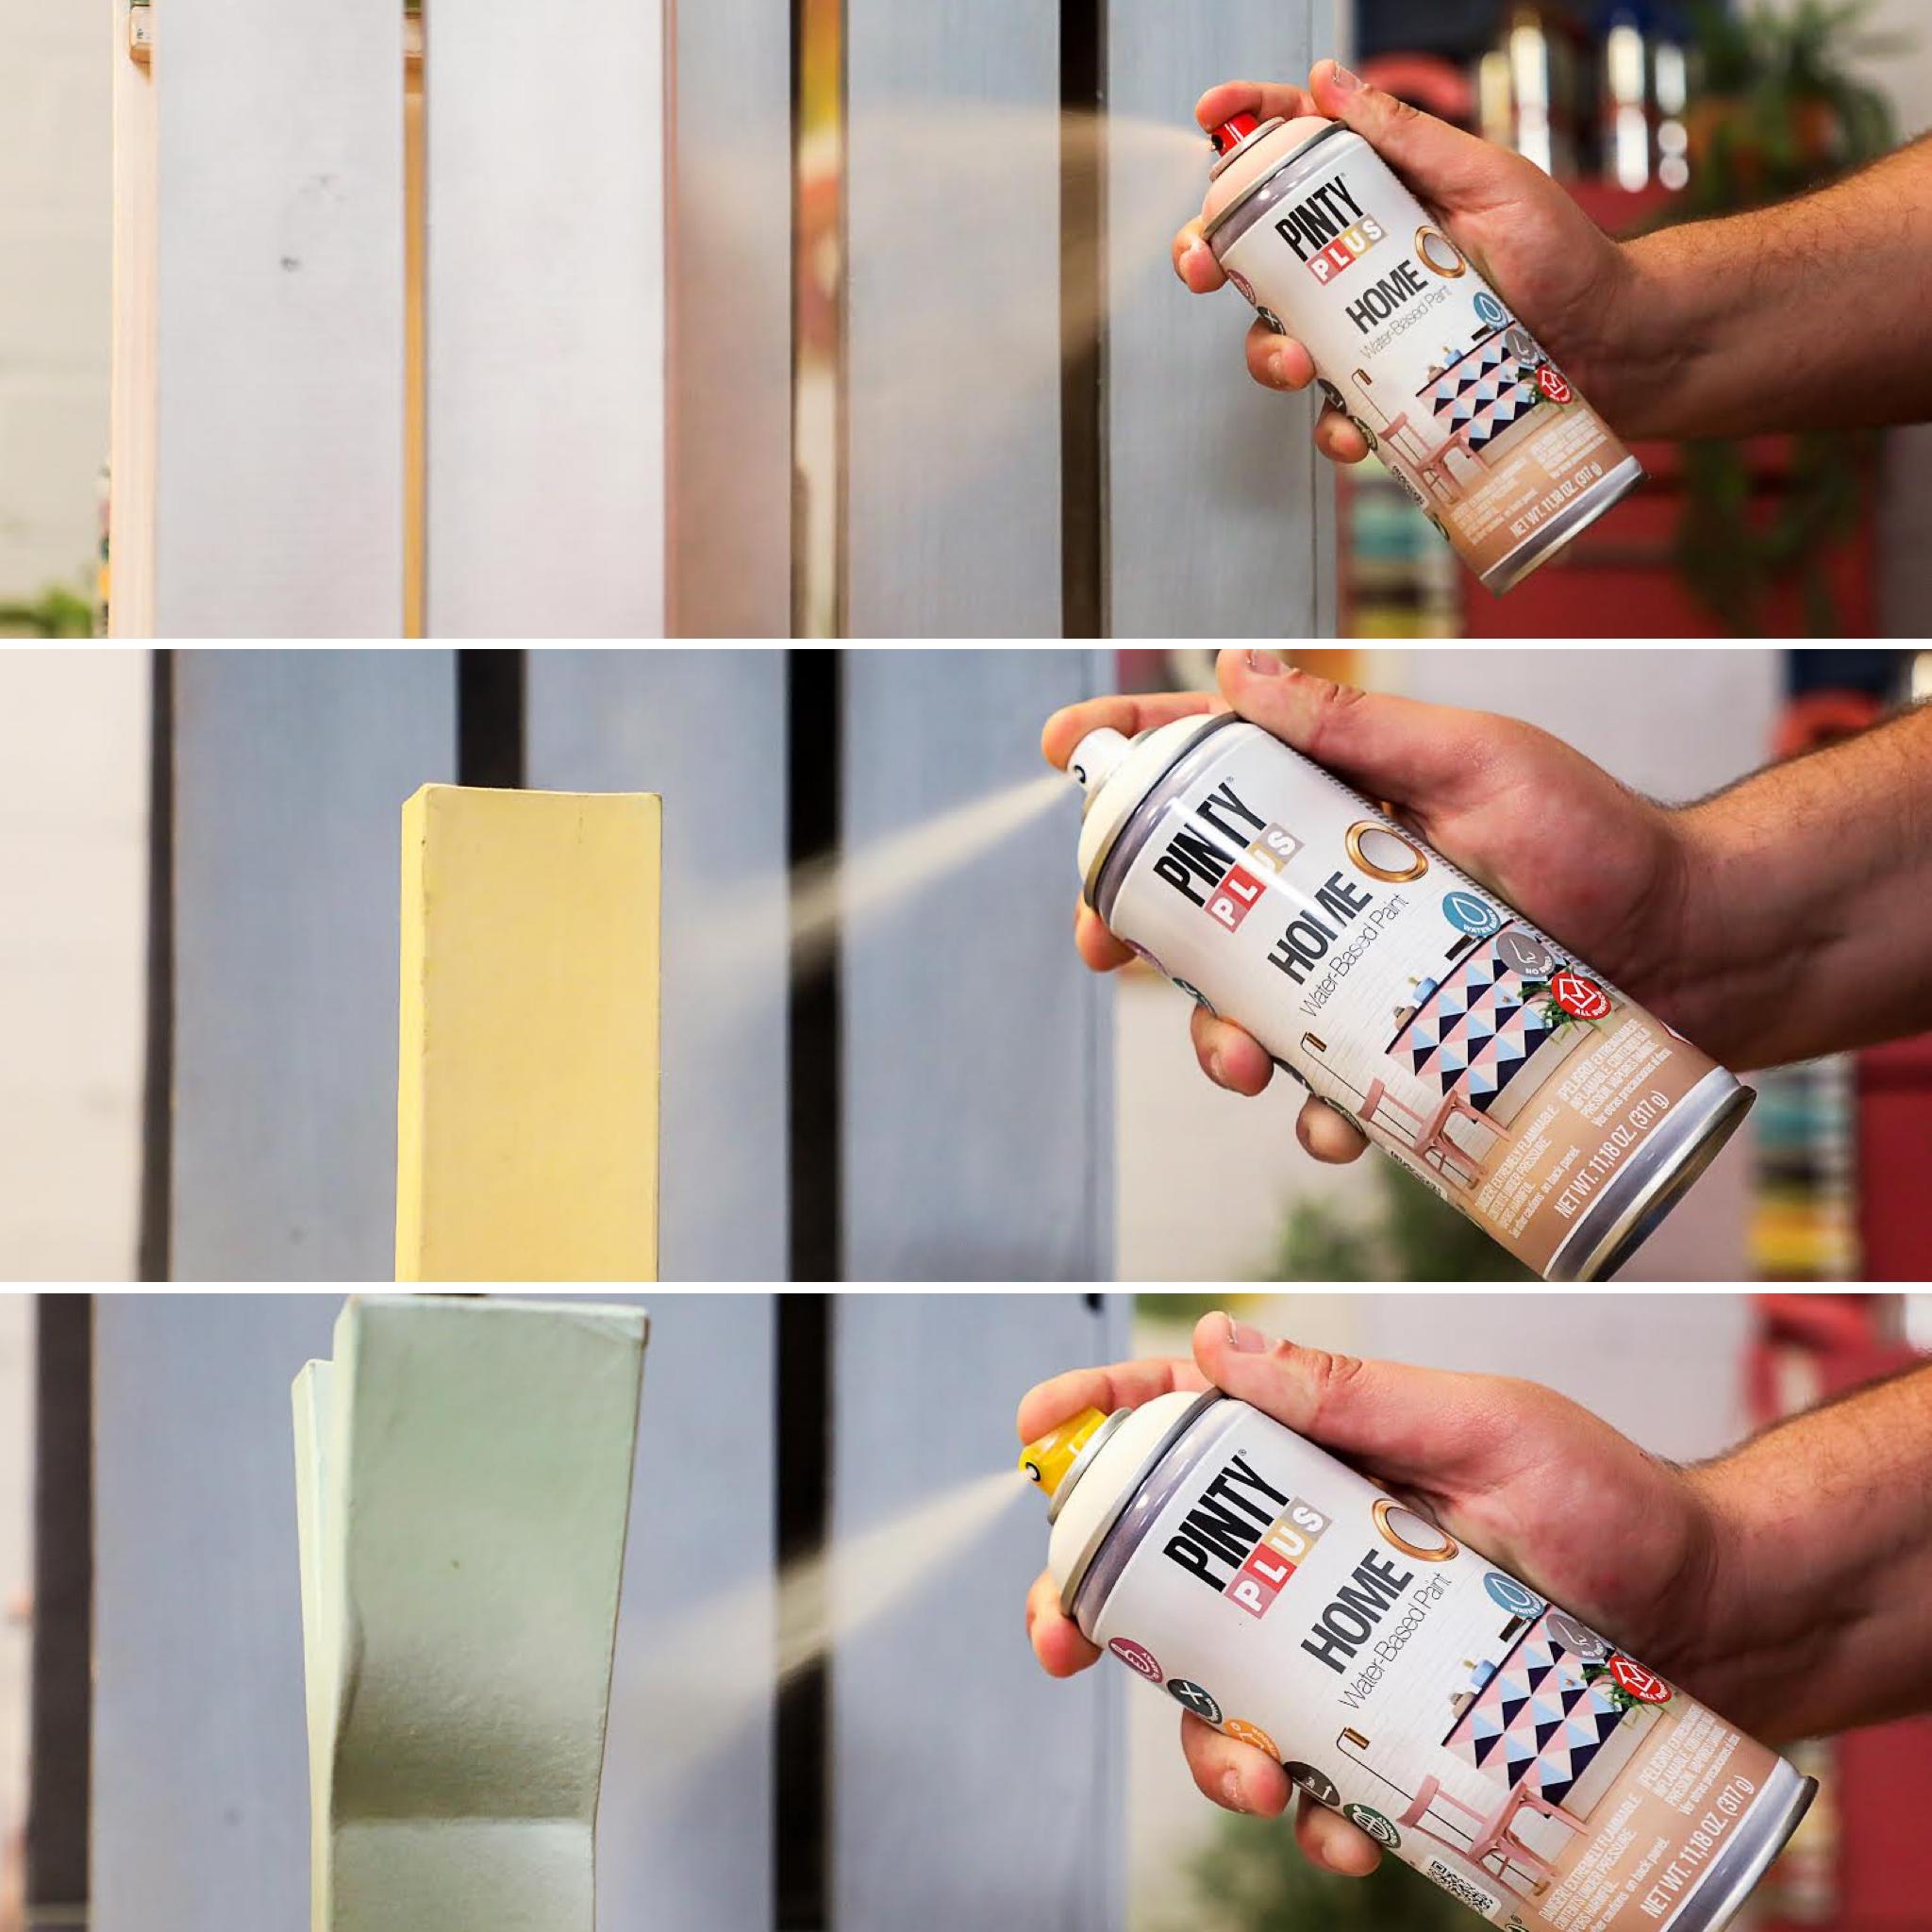 https://www.shakingcolors.com/wp-content/uploads/2019/11/pintar-objetos-muebles-paredes-decoracion-hogar.jpg